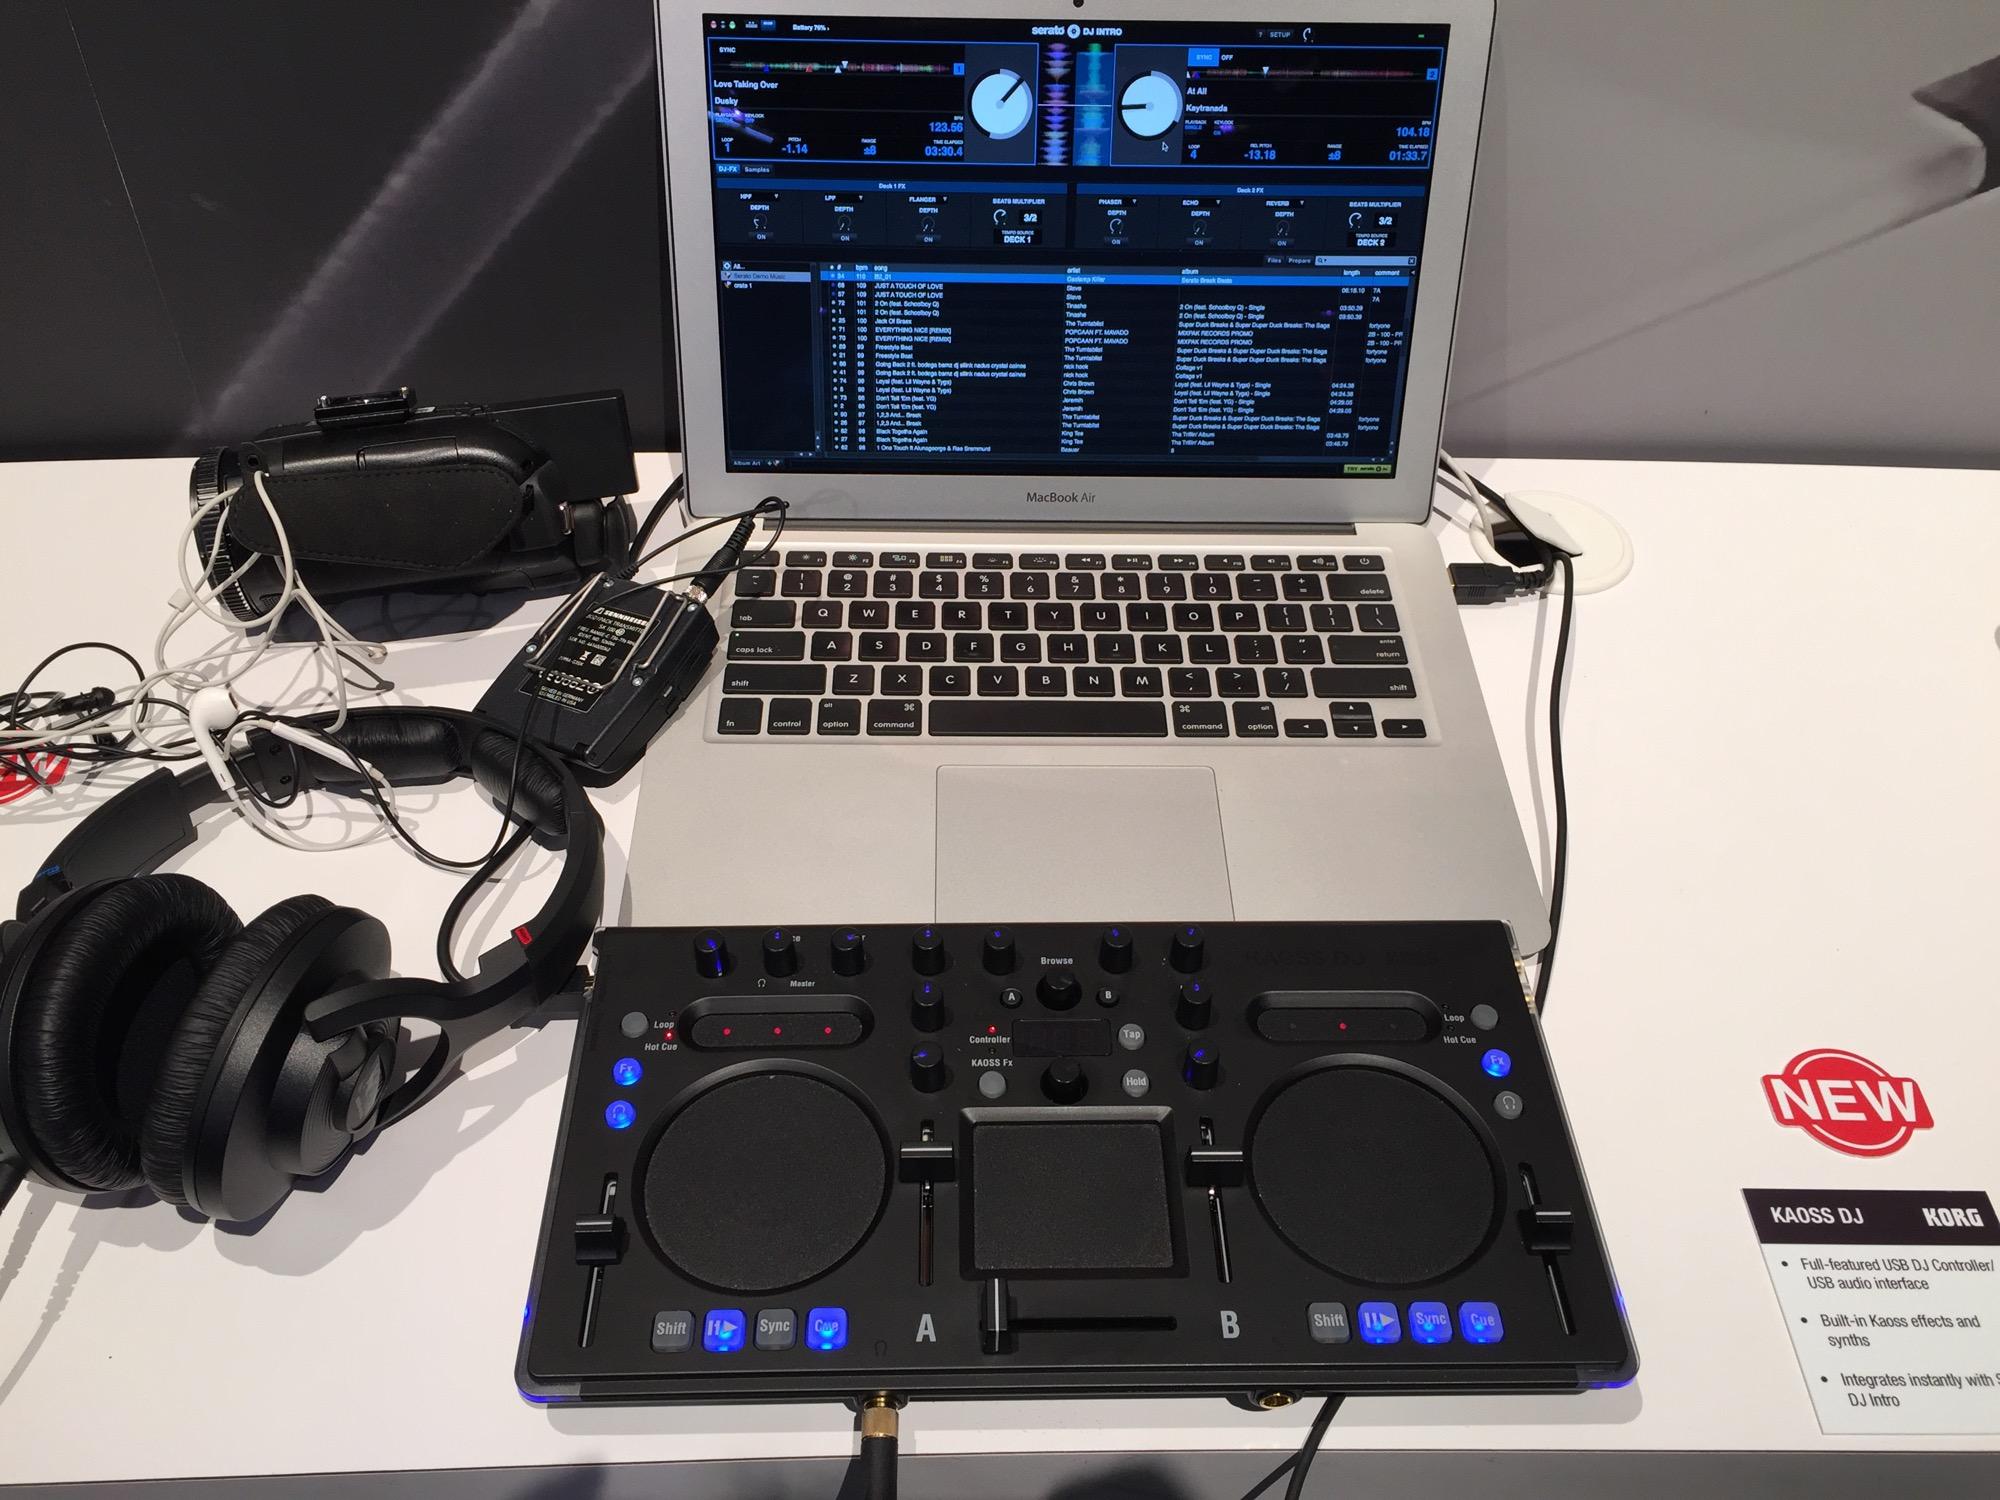 KAOSS DJ 是一款 USB 兼独立运行 DJ 控制器,它具有一个内置的 KAOSS PAD,Korg 知名而独特的触摸板效果设备。 本文为NAMM SHOW 2015展会现场报道,感谢中音公司为midifan提供独家赞助。  Kaoss DJ其实就是个标准的USB DJ控制器:  左右两个转盘变成了Kaoss Pad触控:  Loop或Cue点也可以通过触控来找:  中间这个才是标准的Kaoss Pad其实,手指在XY轴上移动即可加入效果,Desk A和Desk B可单独通过推子控制所加入的效果量: